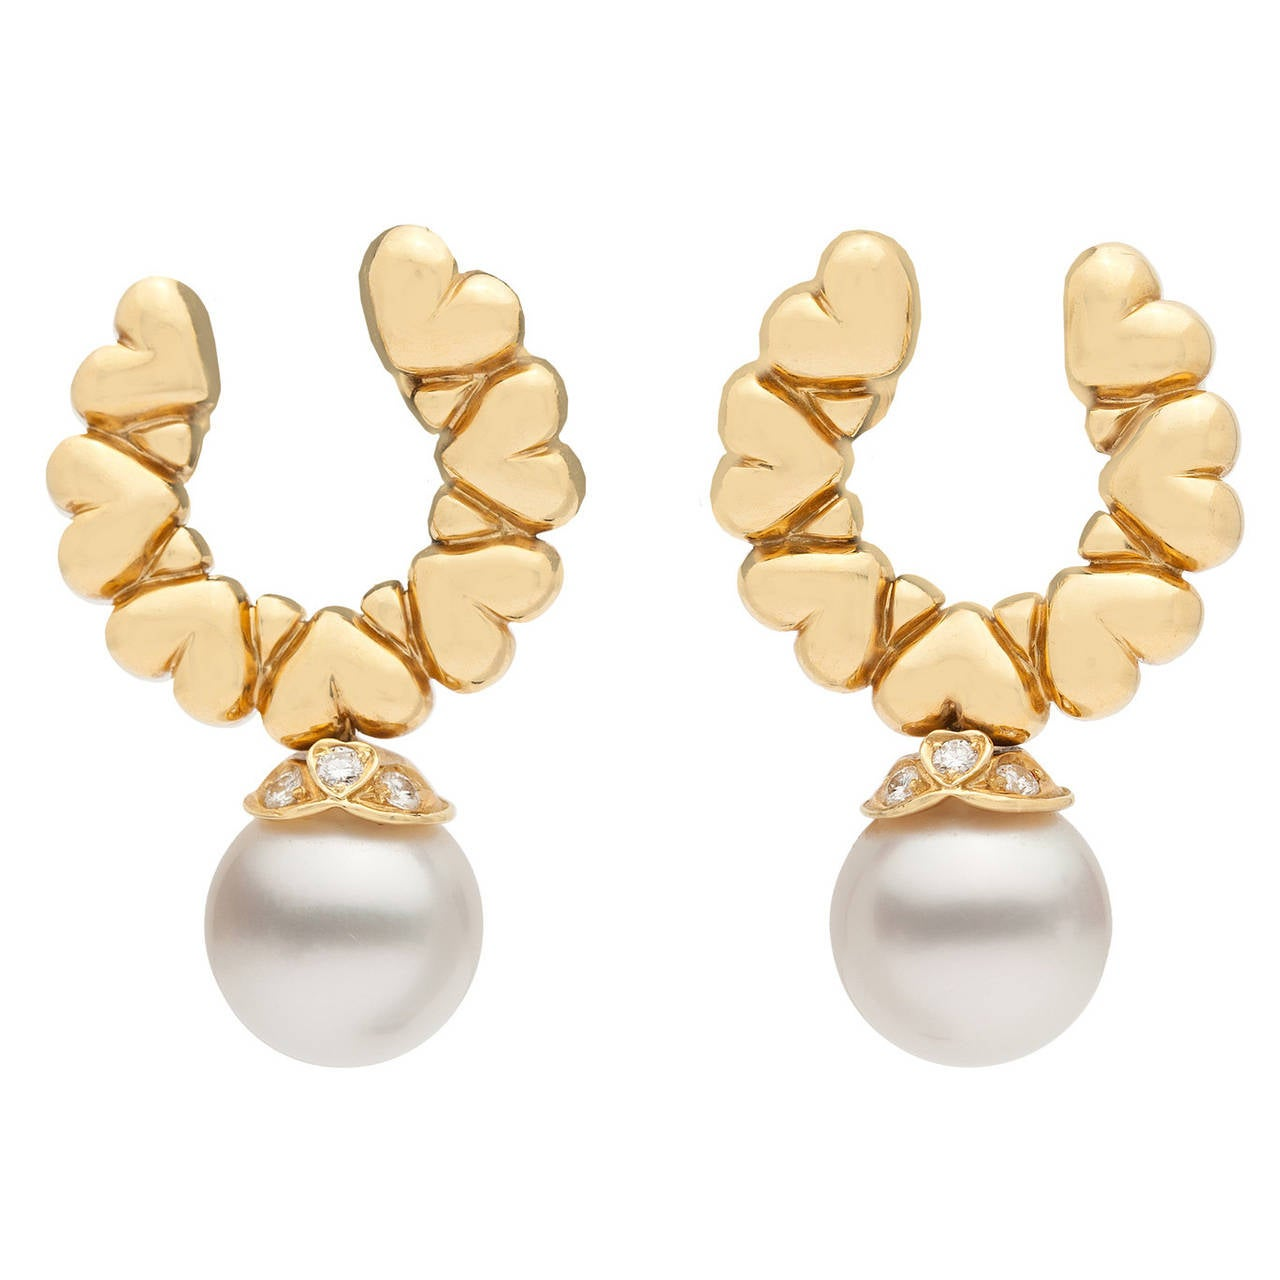 Garrard Pearl Dangle Earrings, circa 1990s For Sale